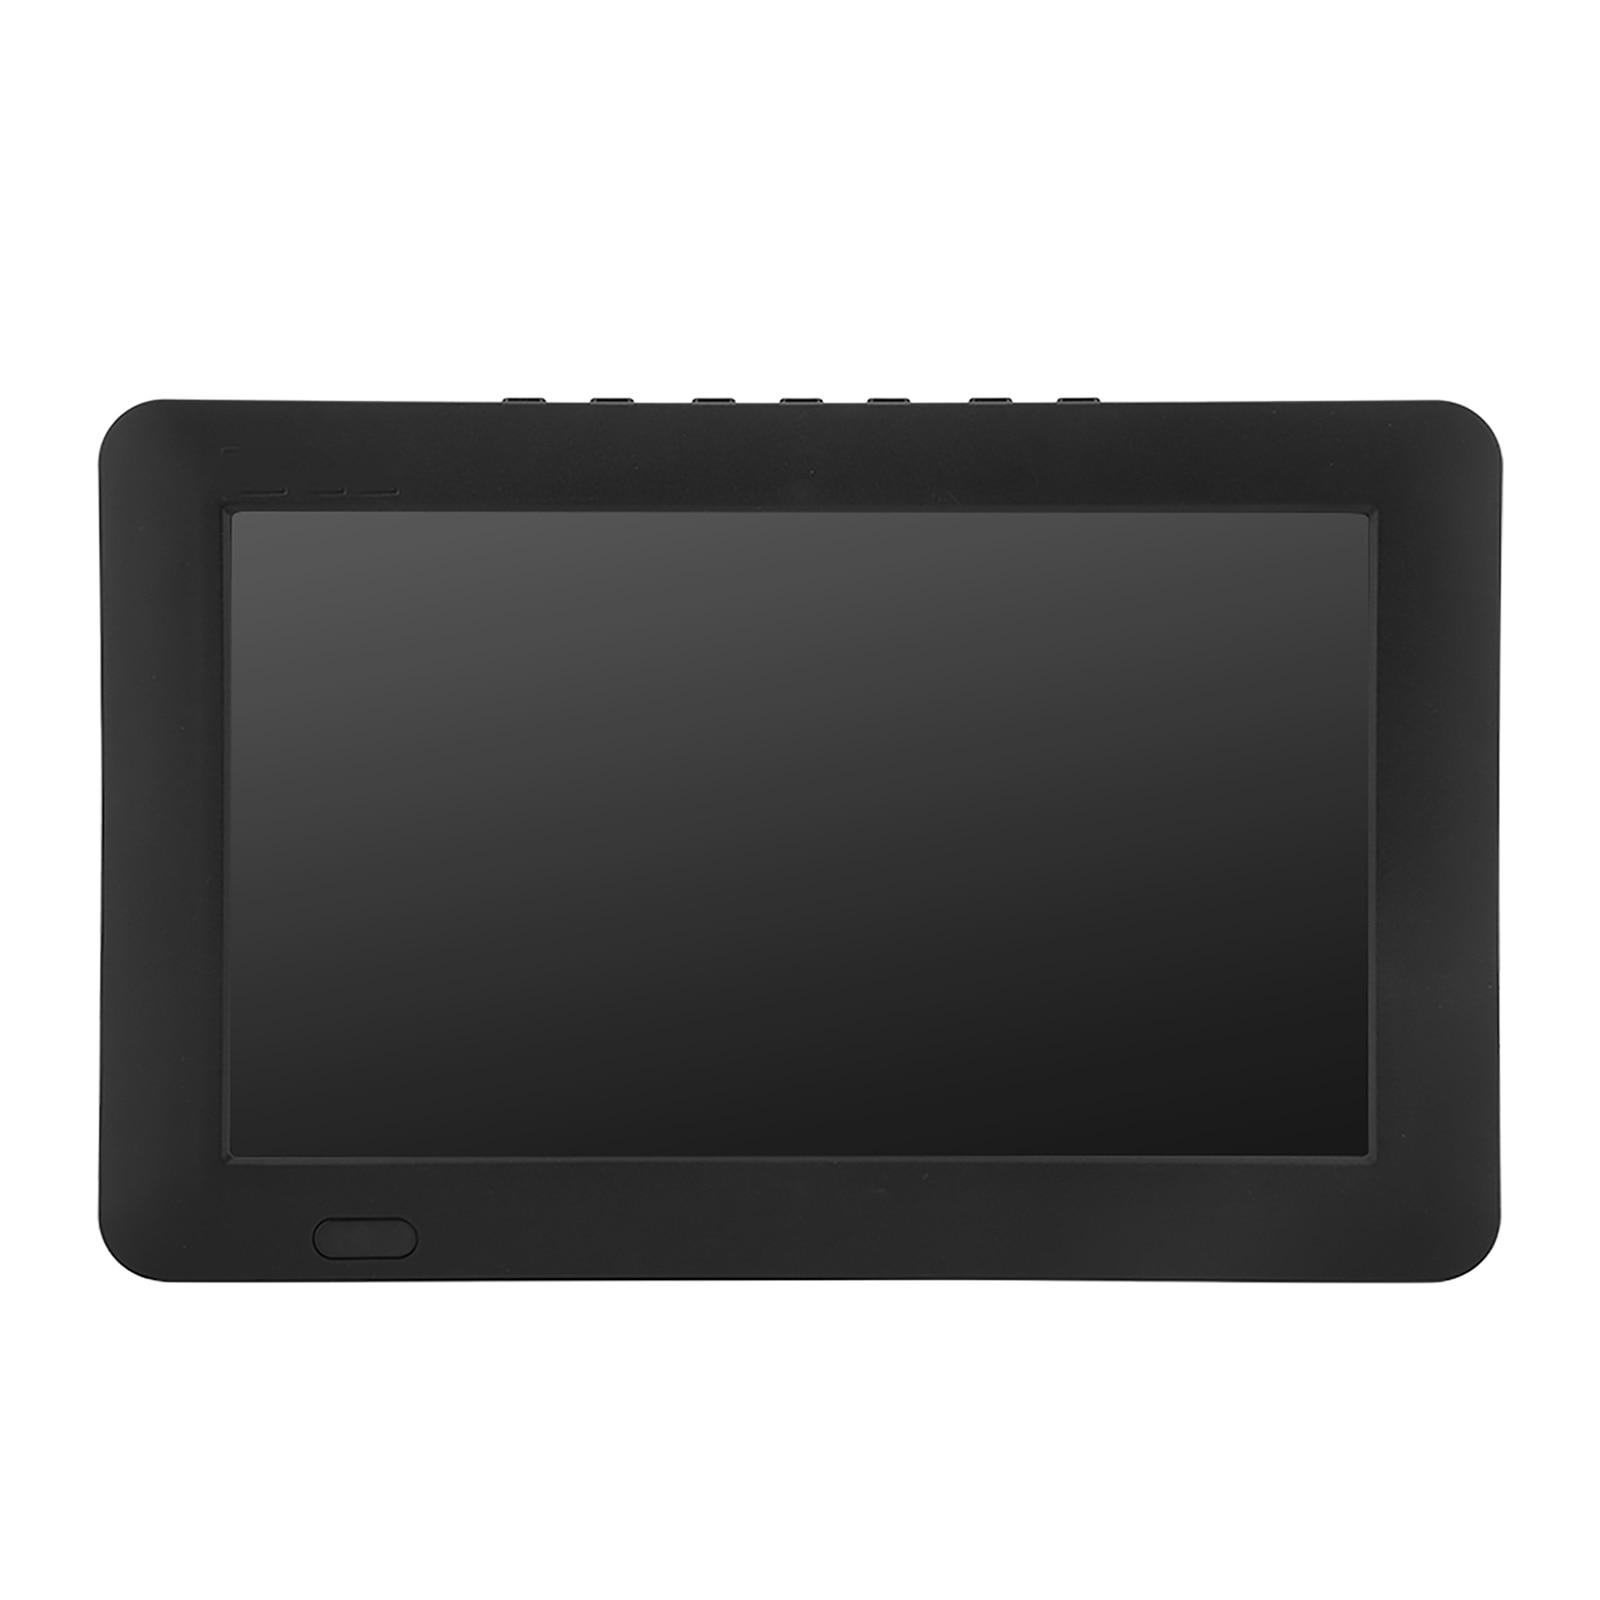 9 Inch HD Portable Digital TV DVB-T2 ATSC ISDB-T TDT Analog Mini Small Car Television Support USB SD Card MP4 AC3 18